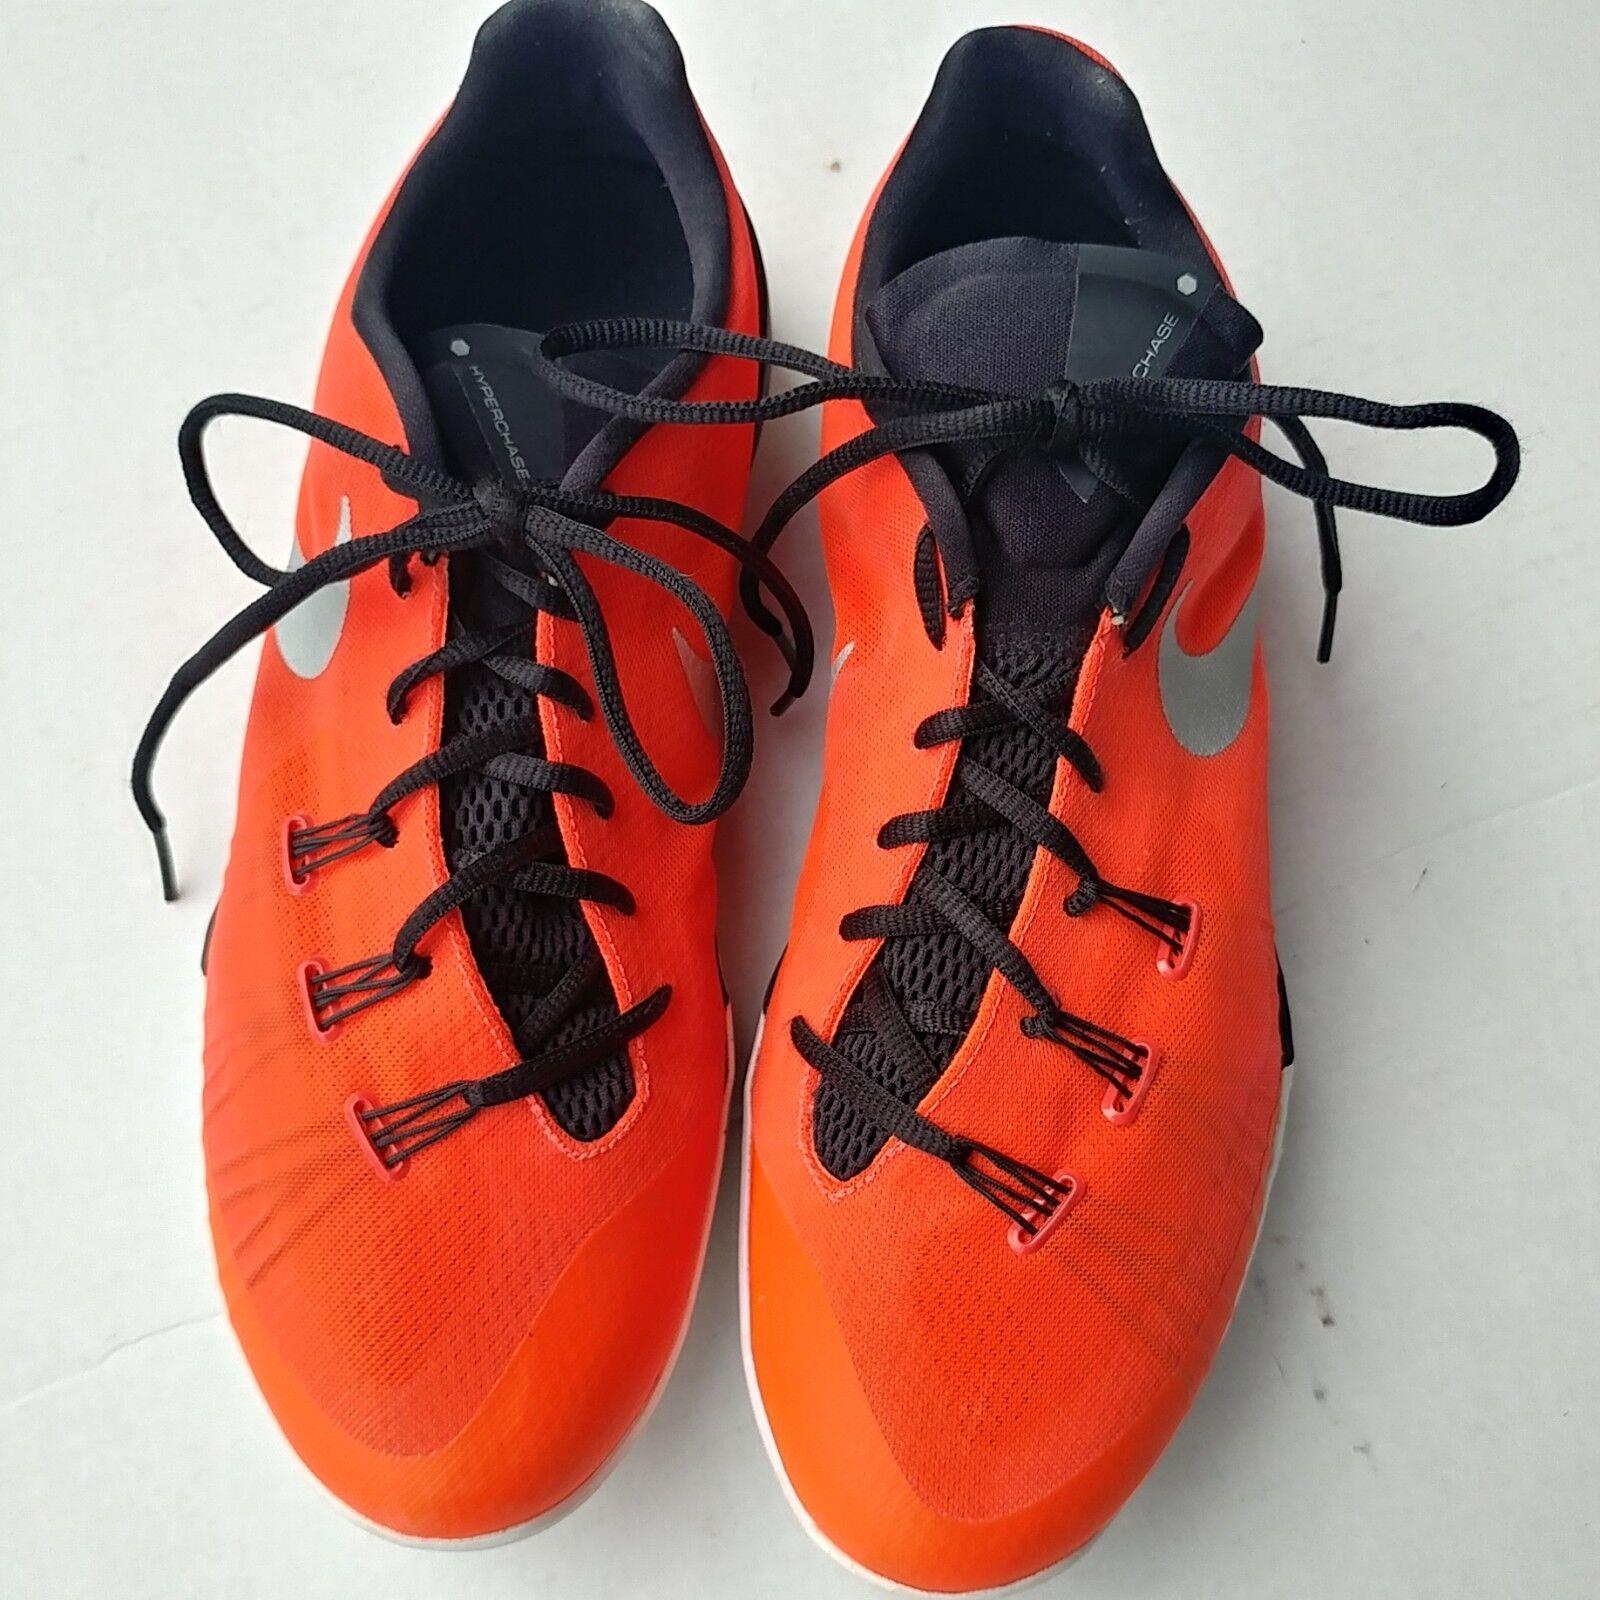 Nike HyperChase Basketball shoes Men's US Size 13 (705363 600)